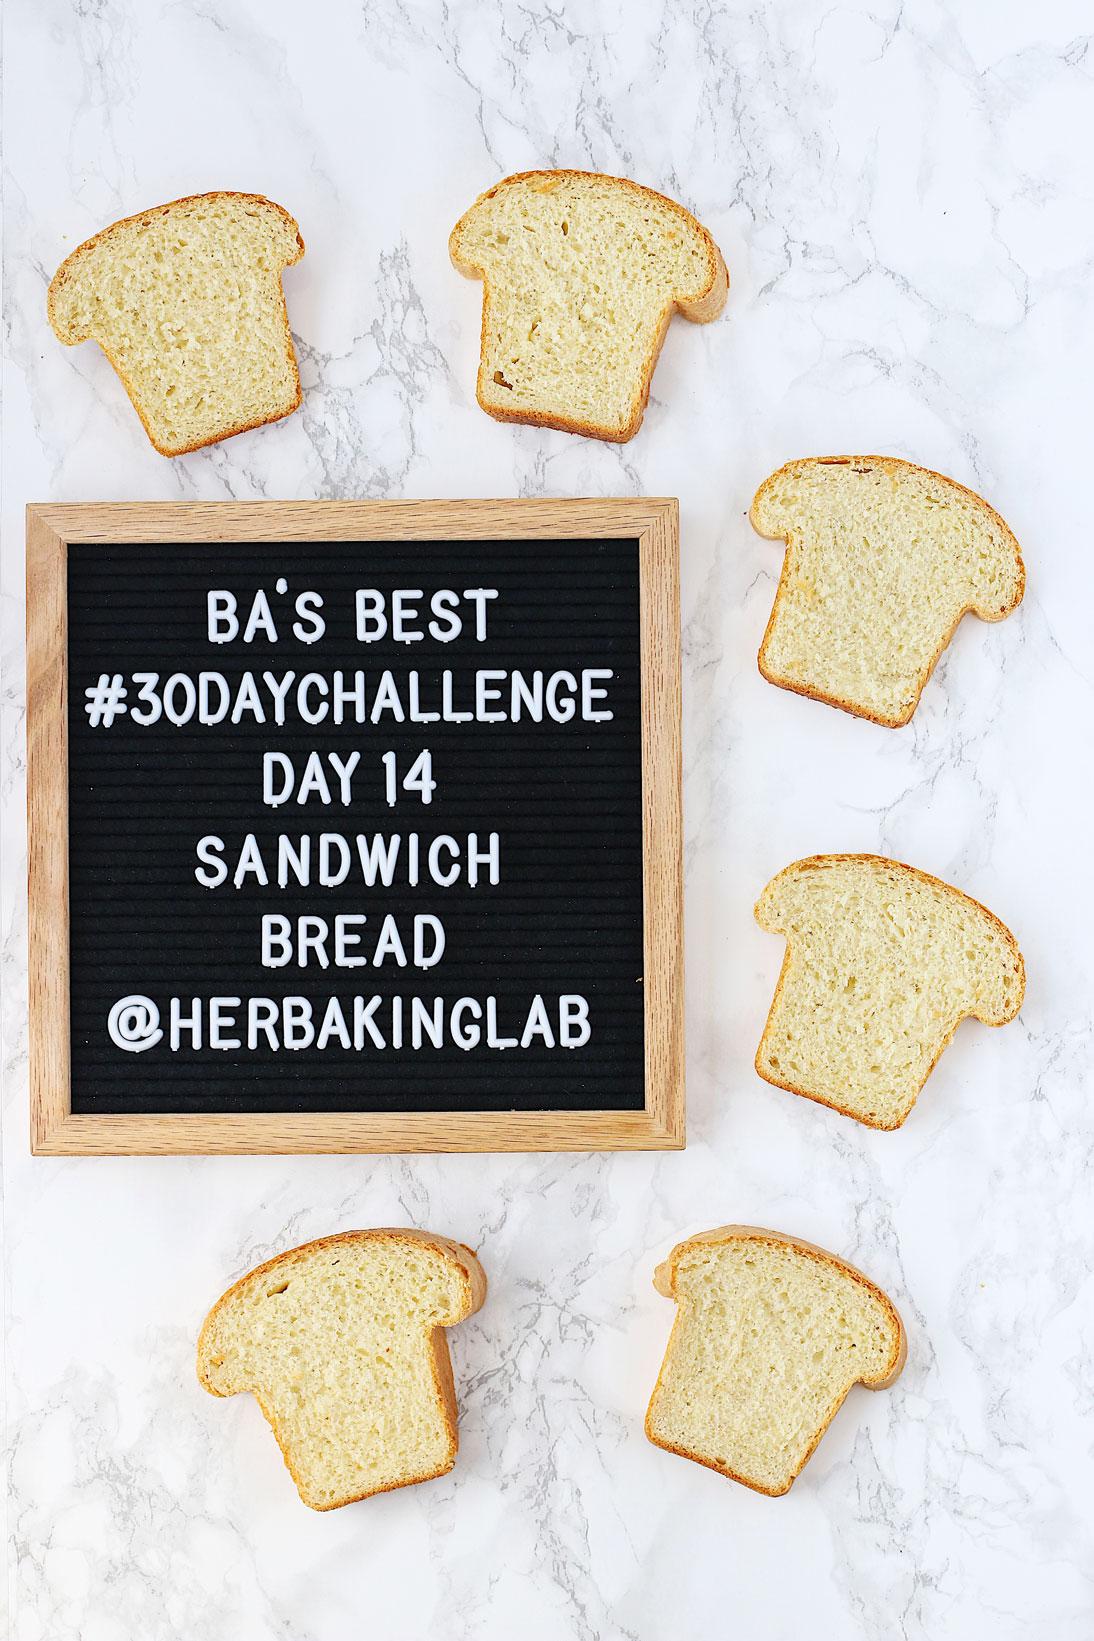 #ba30daychallenge-bon-appetit-best-recipes-day-14-sandwich-bread